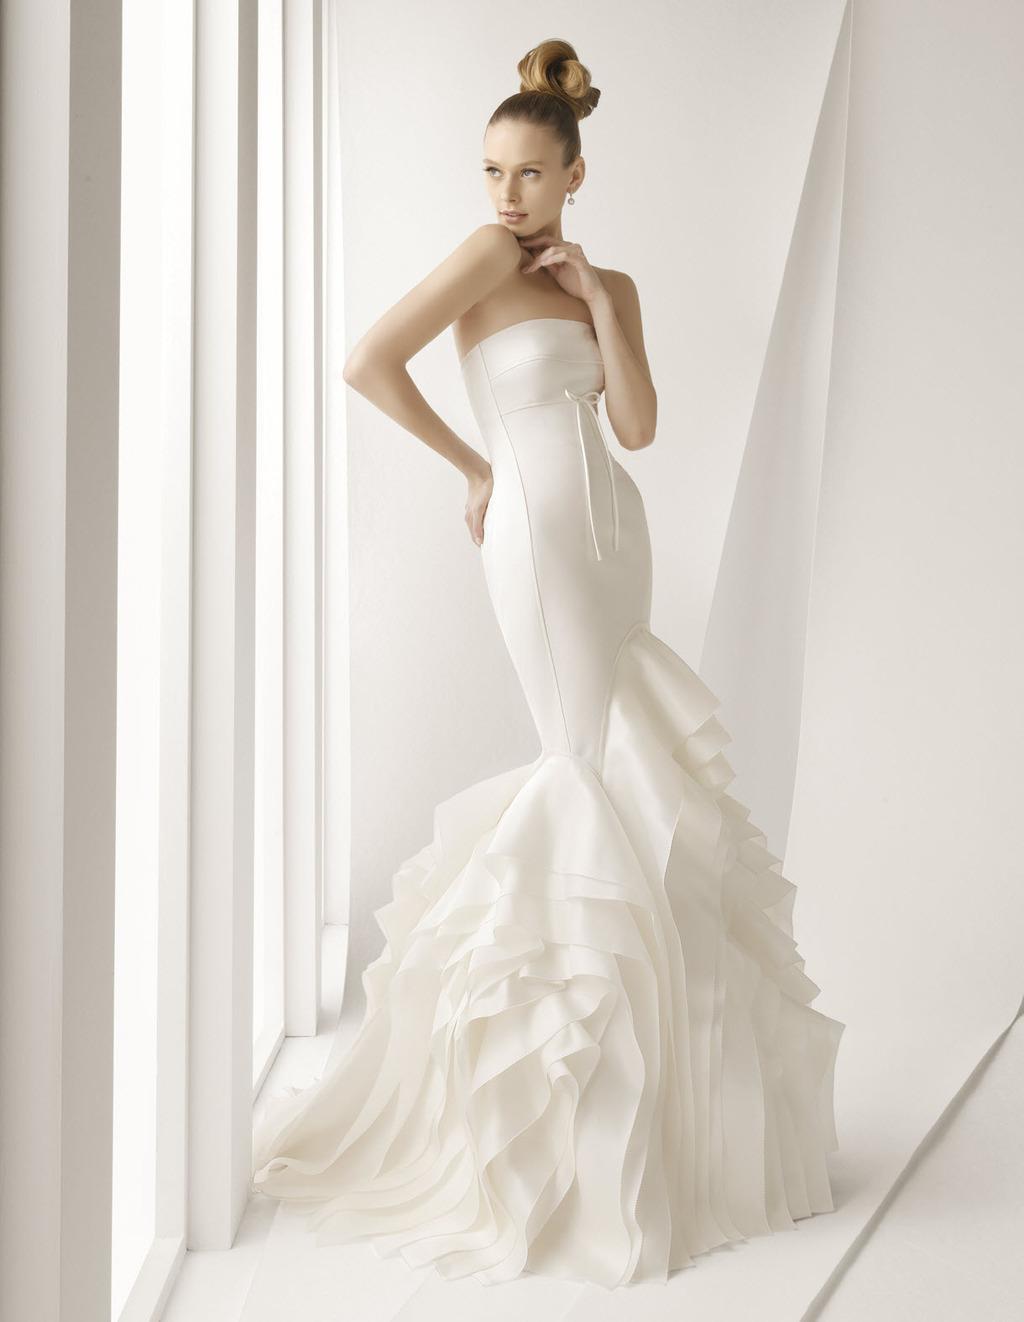 Agnes-spring-2012-wedding-dress-rosa-clara-bridal-gowns-strapless-dramatic-mermaid.full